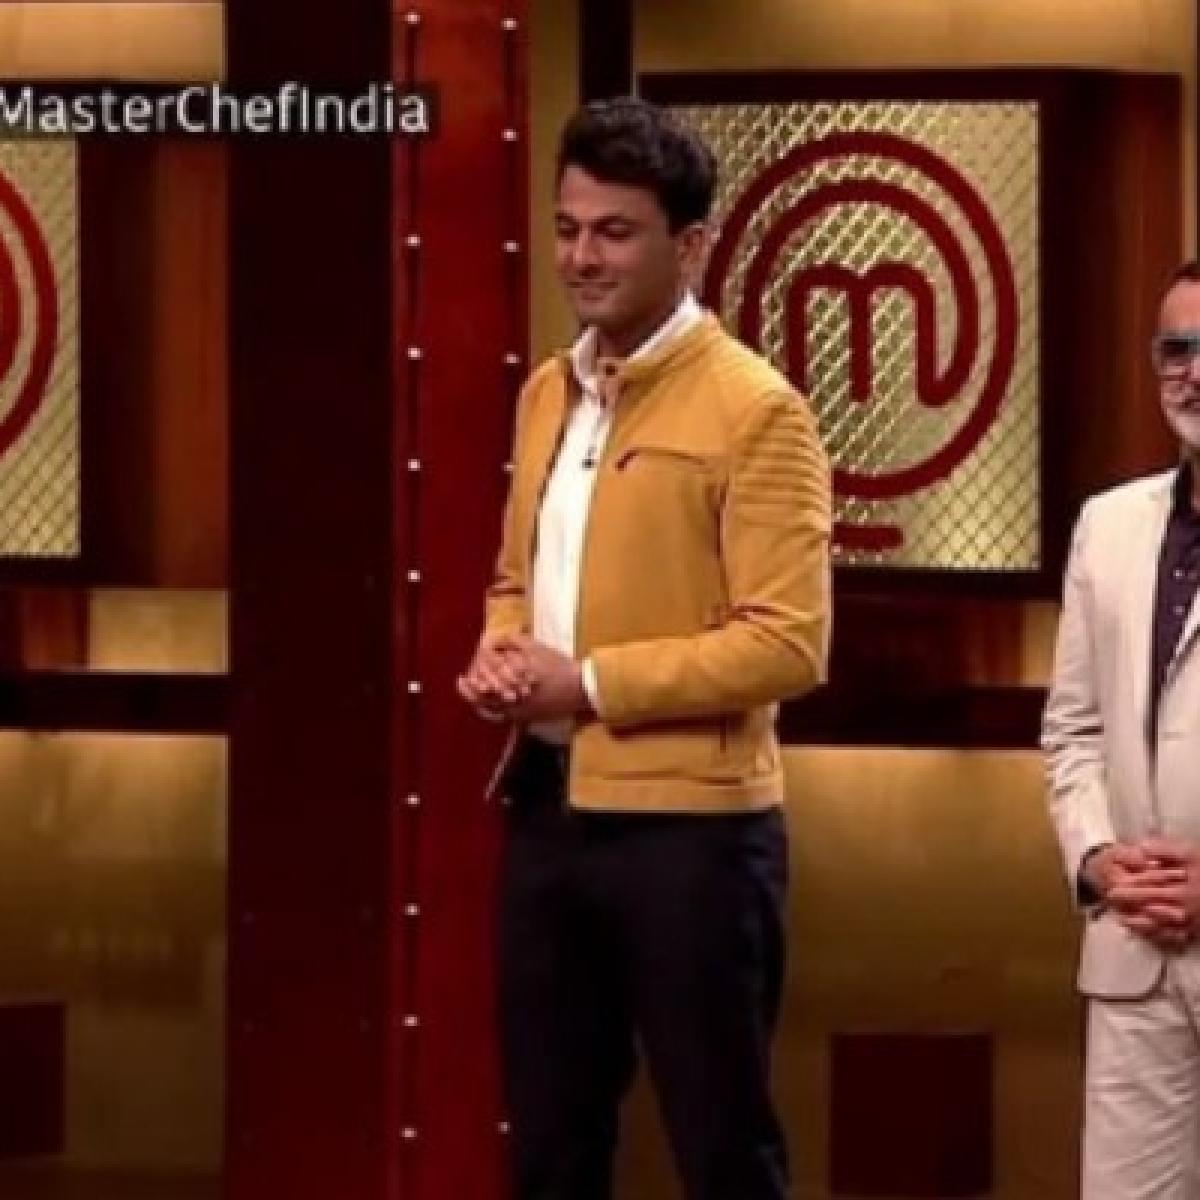 MasterChef India 6: Chefs Vikas Khanna, Ranveer Brar, Vineet Bhatia fasten their aprons